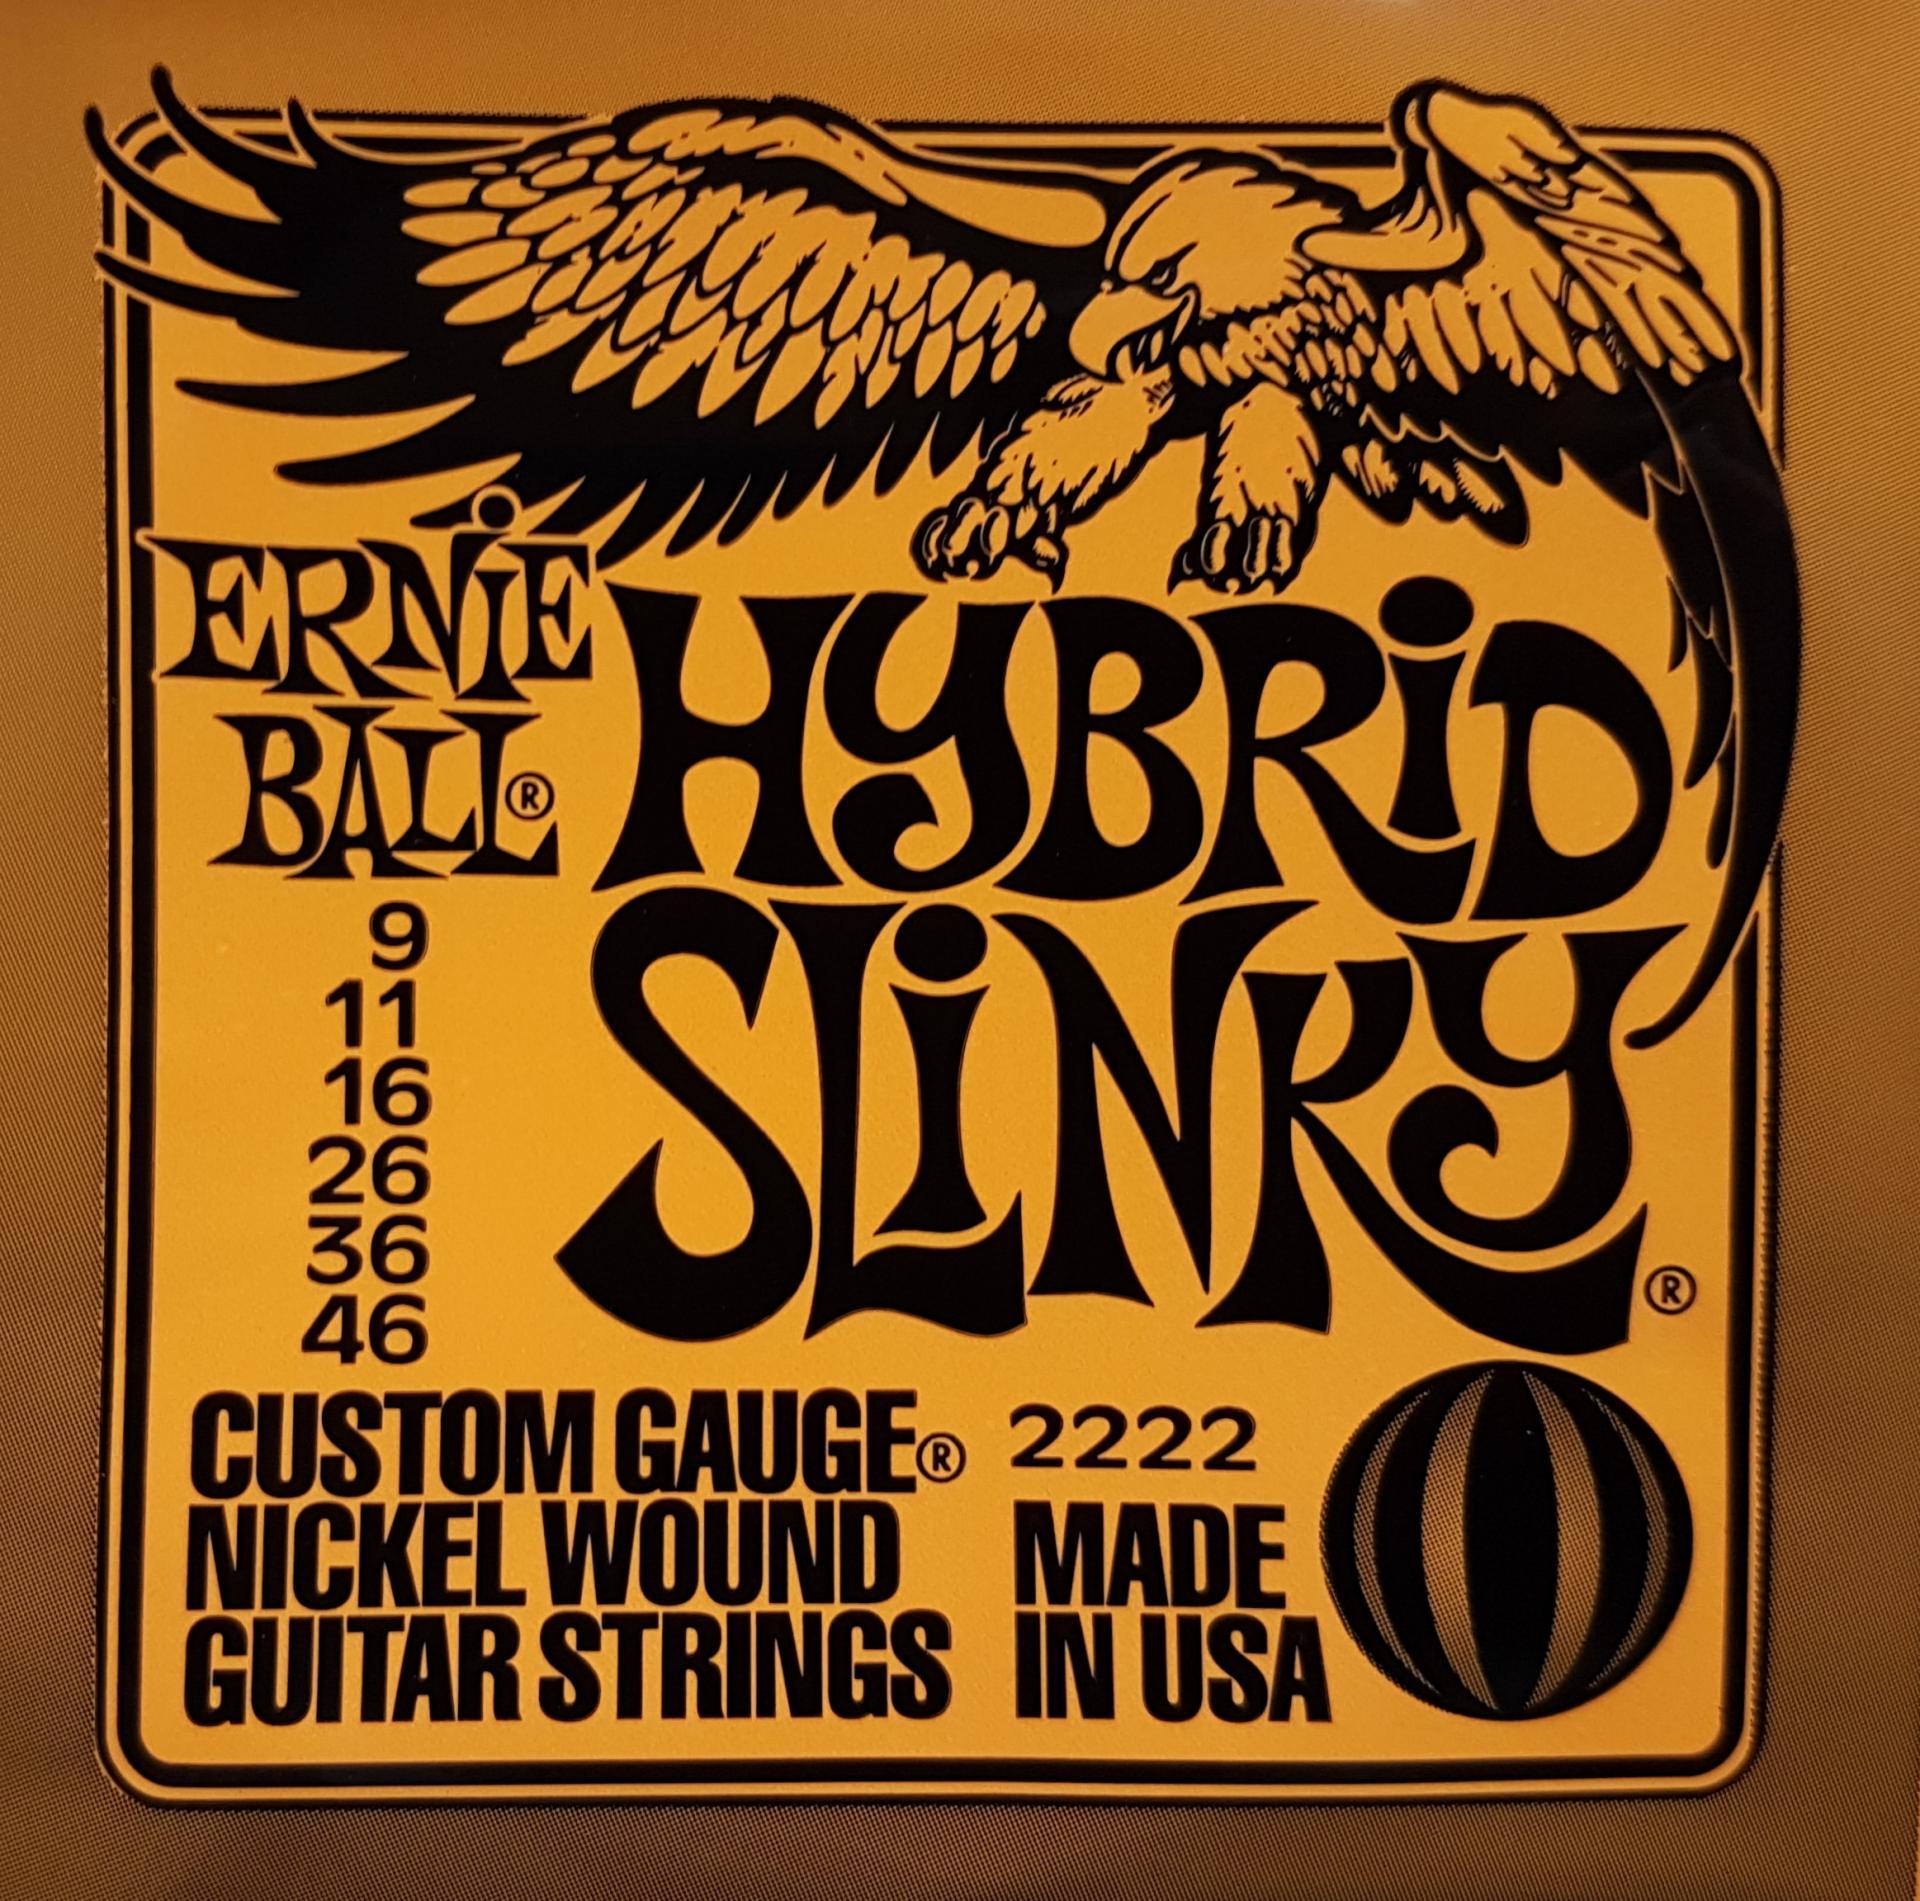 Ernieball hybrid 9 46